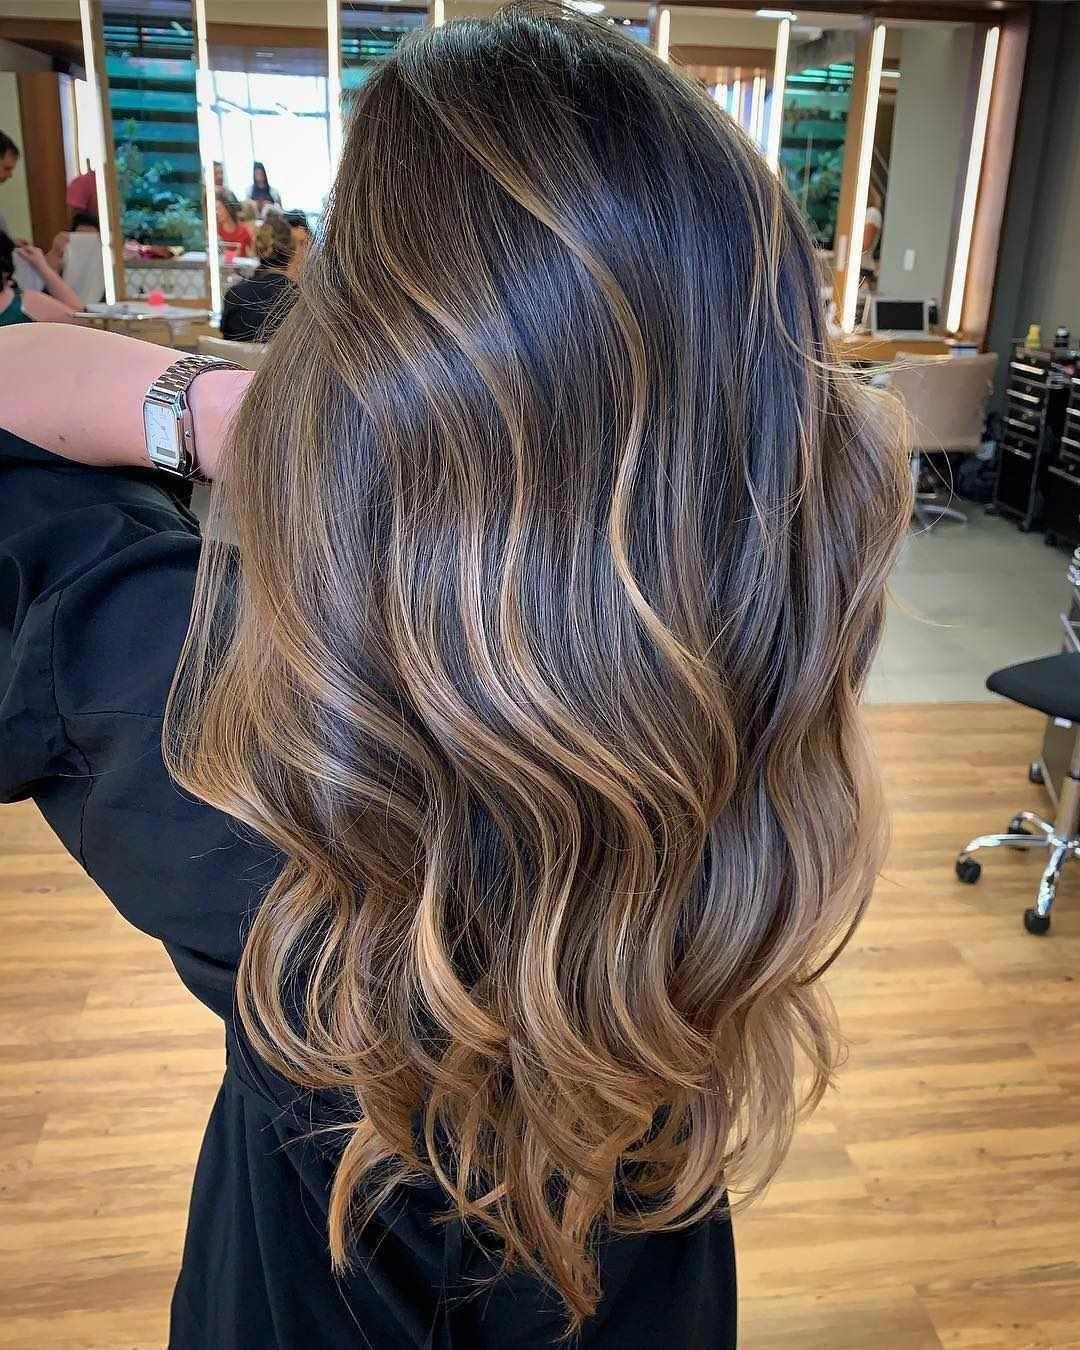 30 Balayage Hair Ideas For Long And Short Hair 2019 Balayagehair Balayagehaircut Balayagehairstyle Blondeh In 2020 Hair Styles Balayage Hair Short Hair Balayage